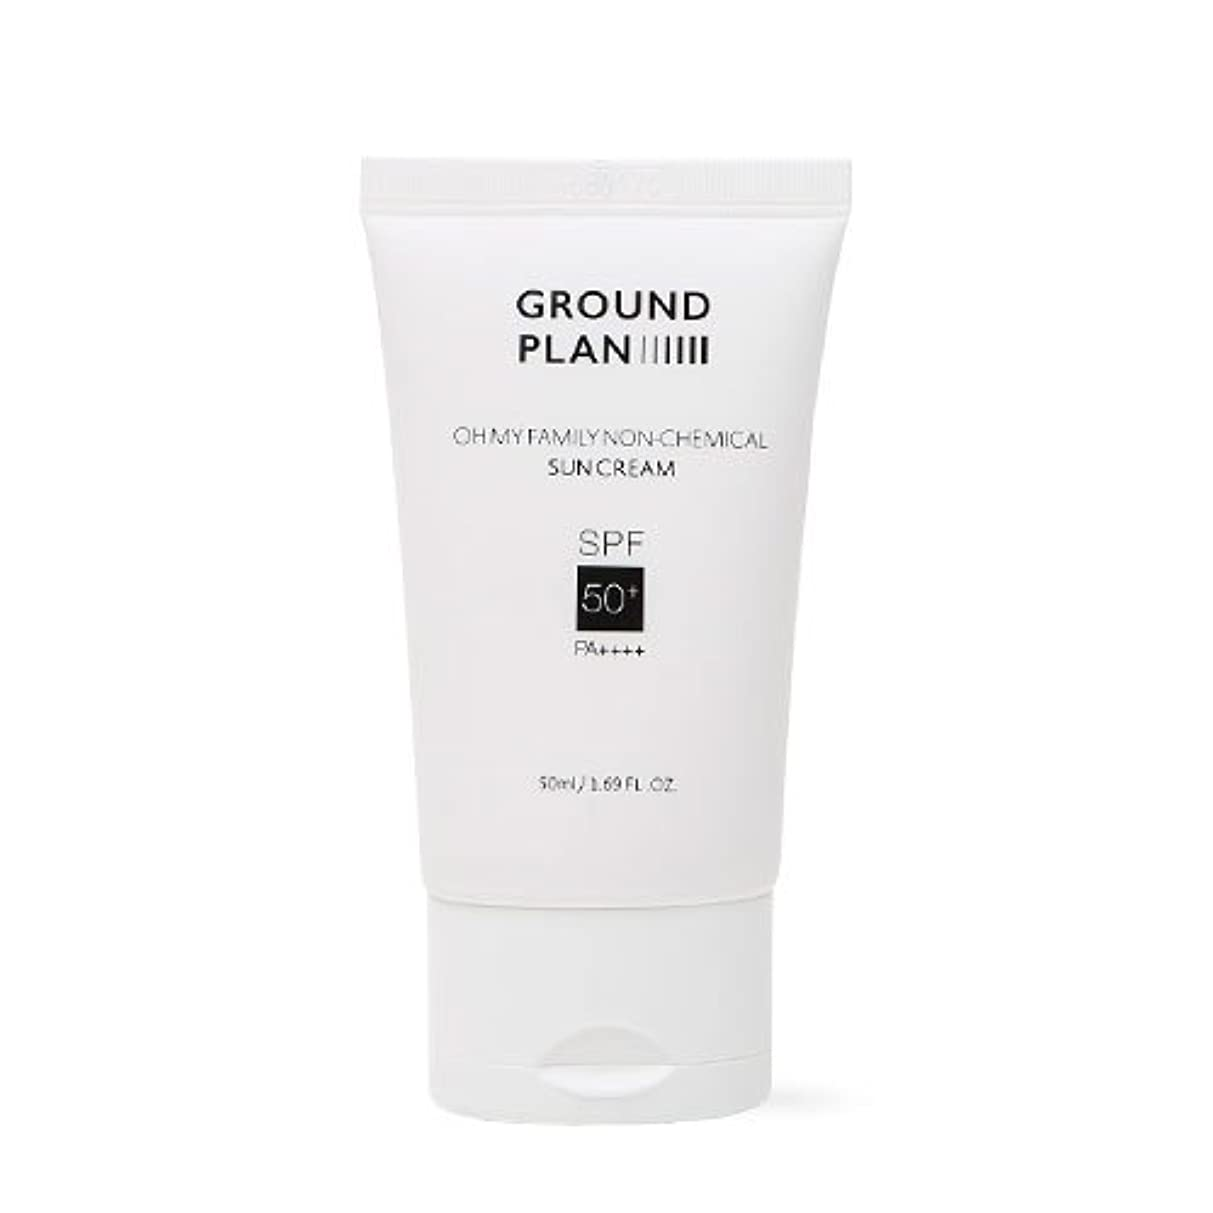 [GROUND PLAN] Oh My Family Non-Chemical Sun Cream 50ml グラウンドプランファミリーノンケミカルサンクリーム [並行輸入品]